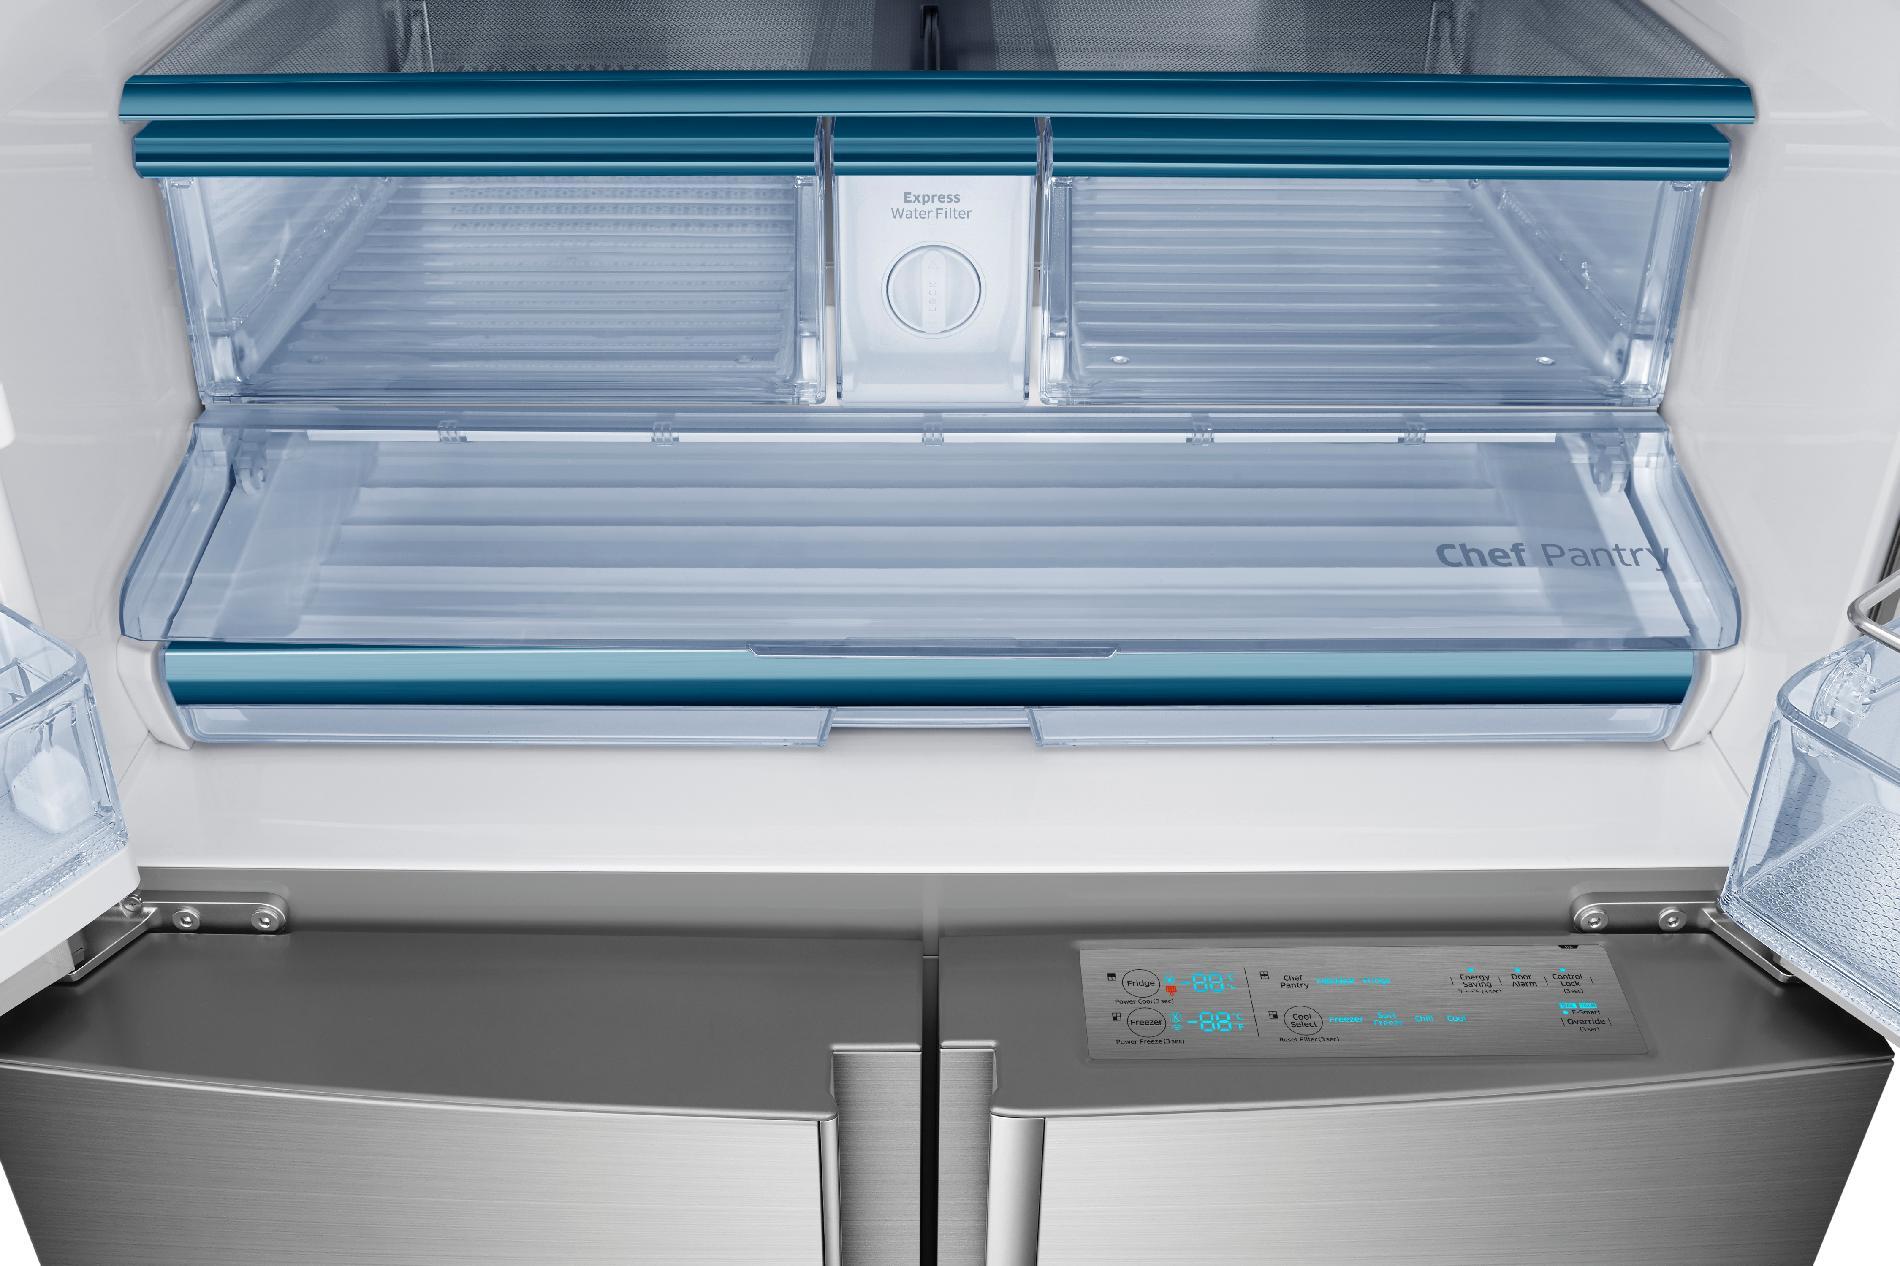 Samsung 34 cu. ft. Chef Collection 4-Door Flex™ Refrigerator - Stainless Steel